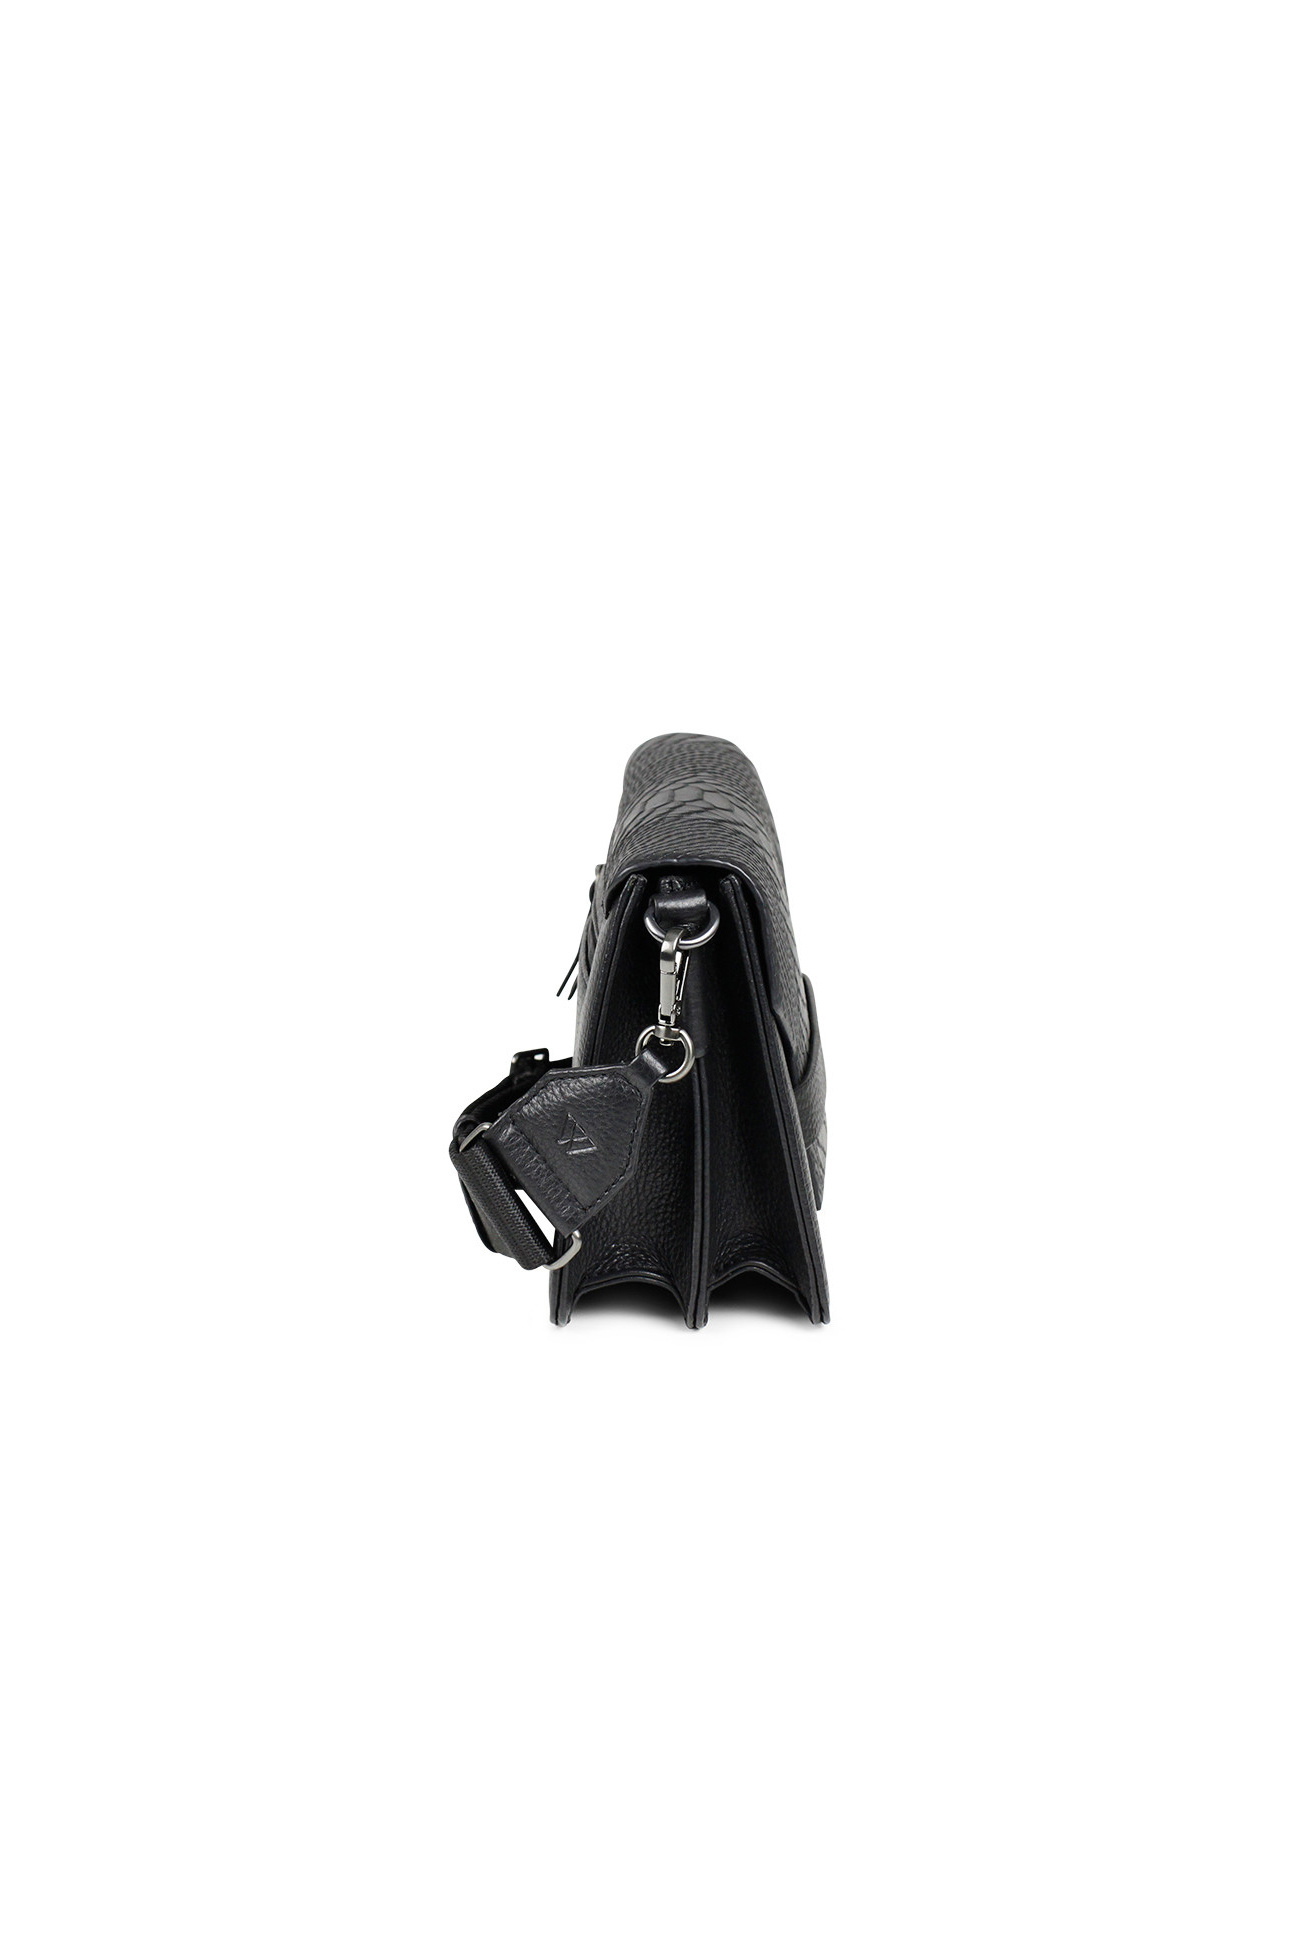 Arabella Crossbody Bag Snake - Black w/ Black-5